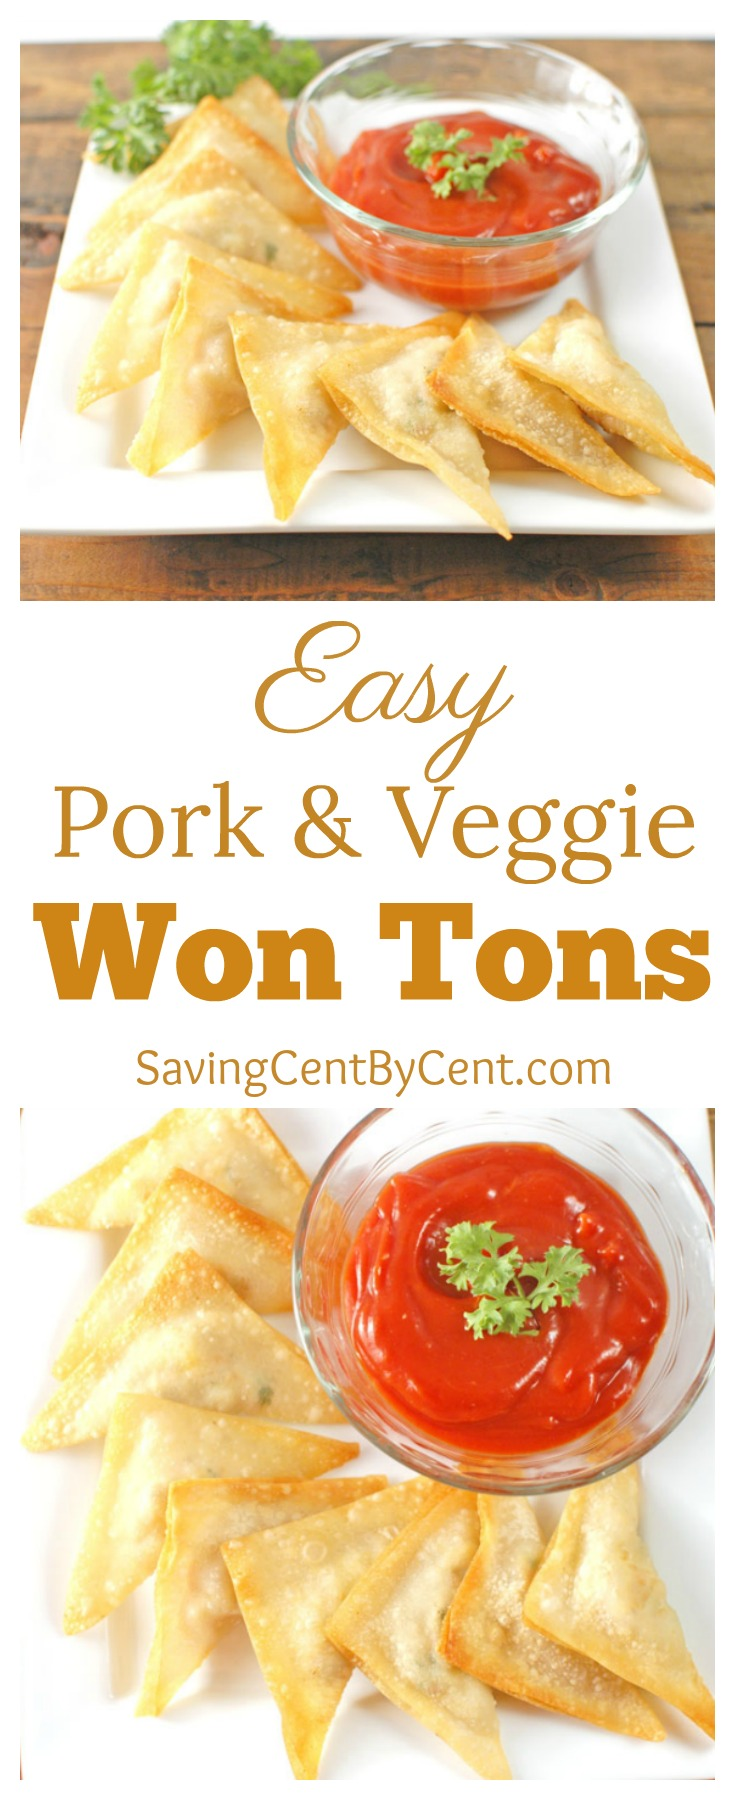 Easy Pork and Veggie Won Tons